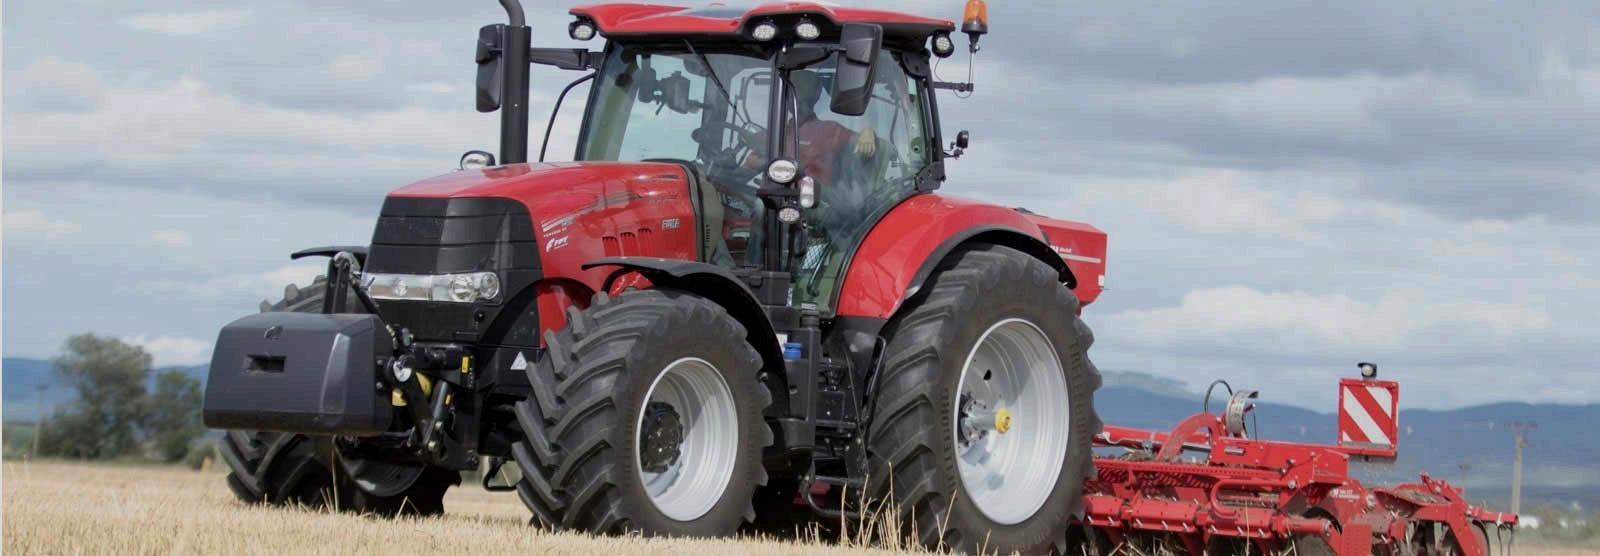 Трактори и прикачен инвертар